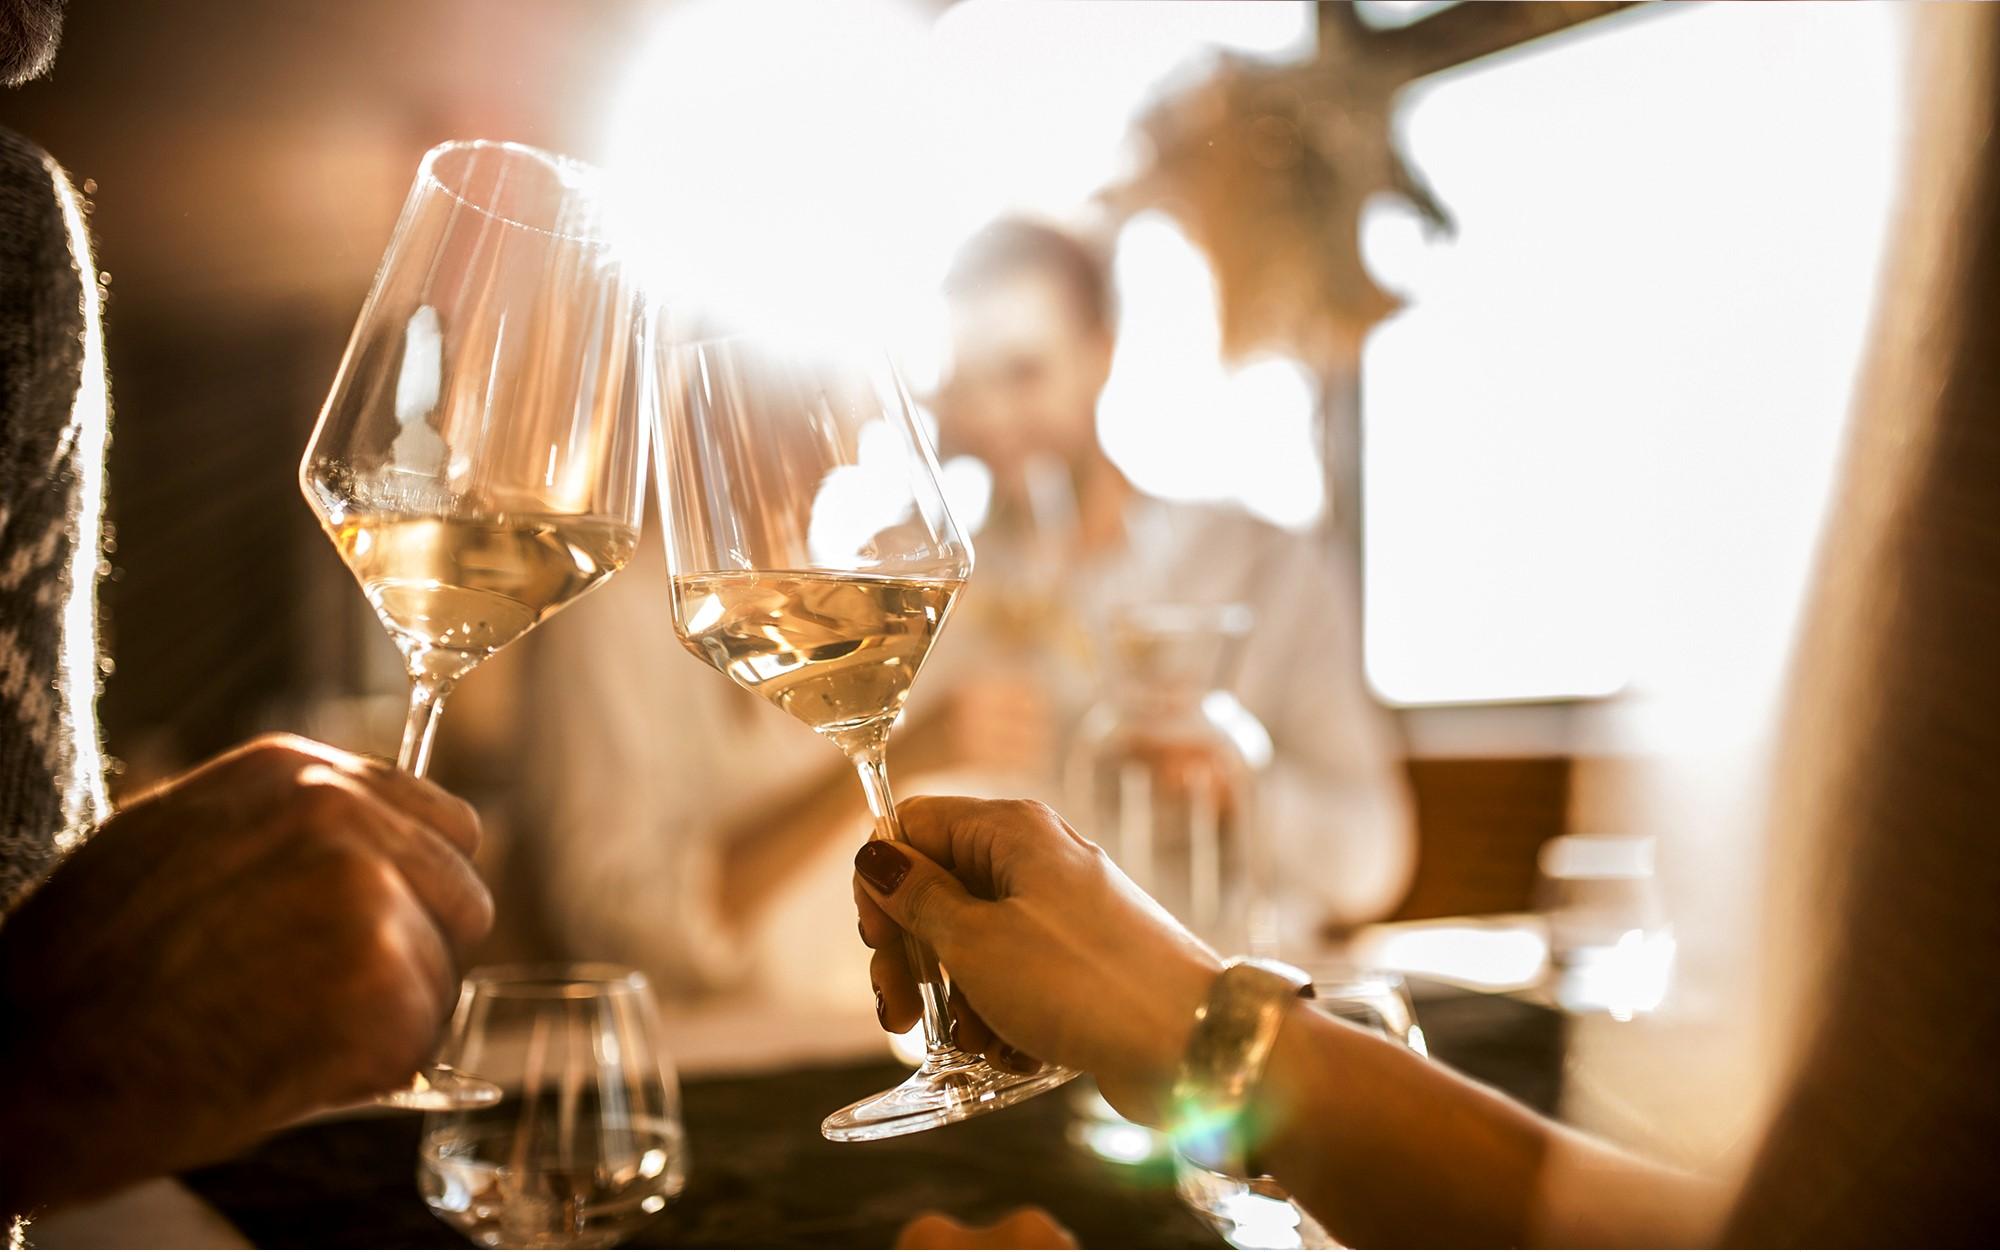 Sandalford-Wines-Celebration.jpg